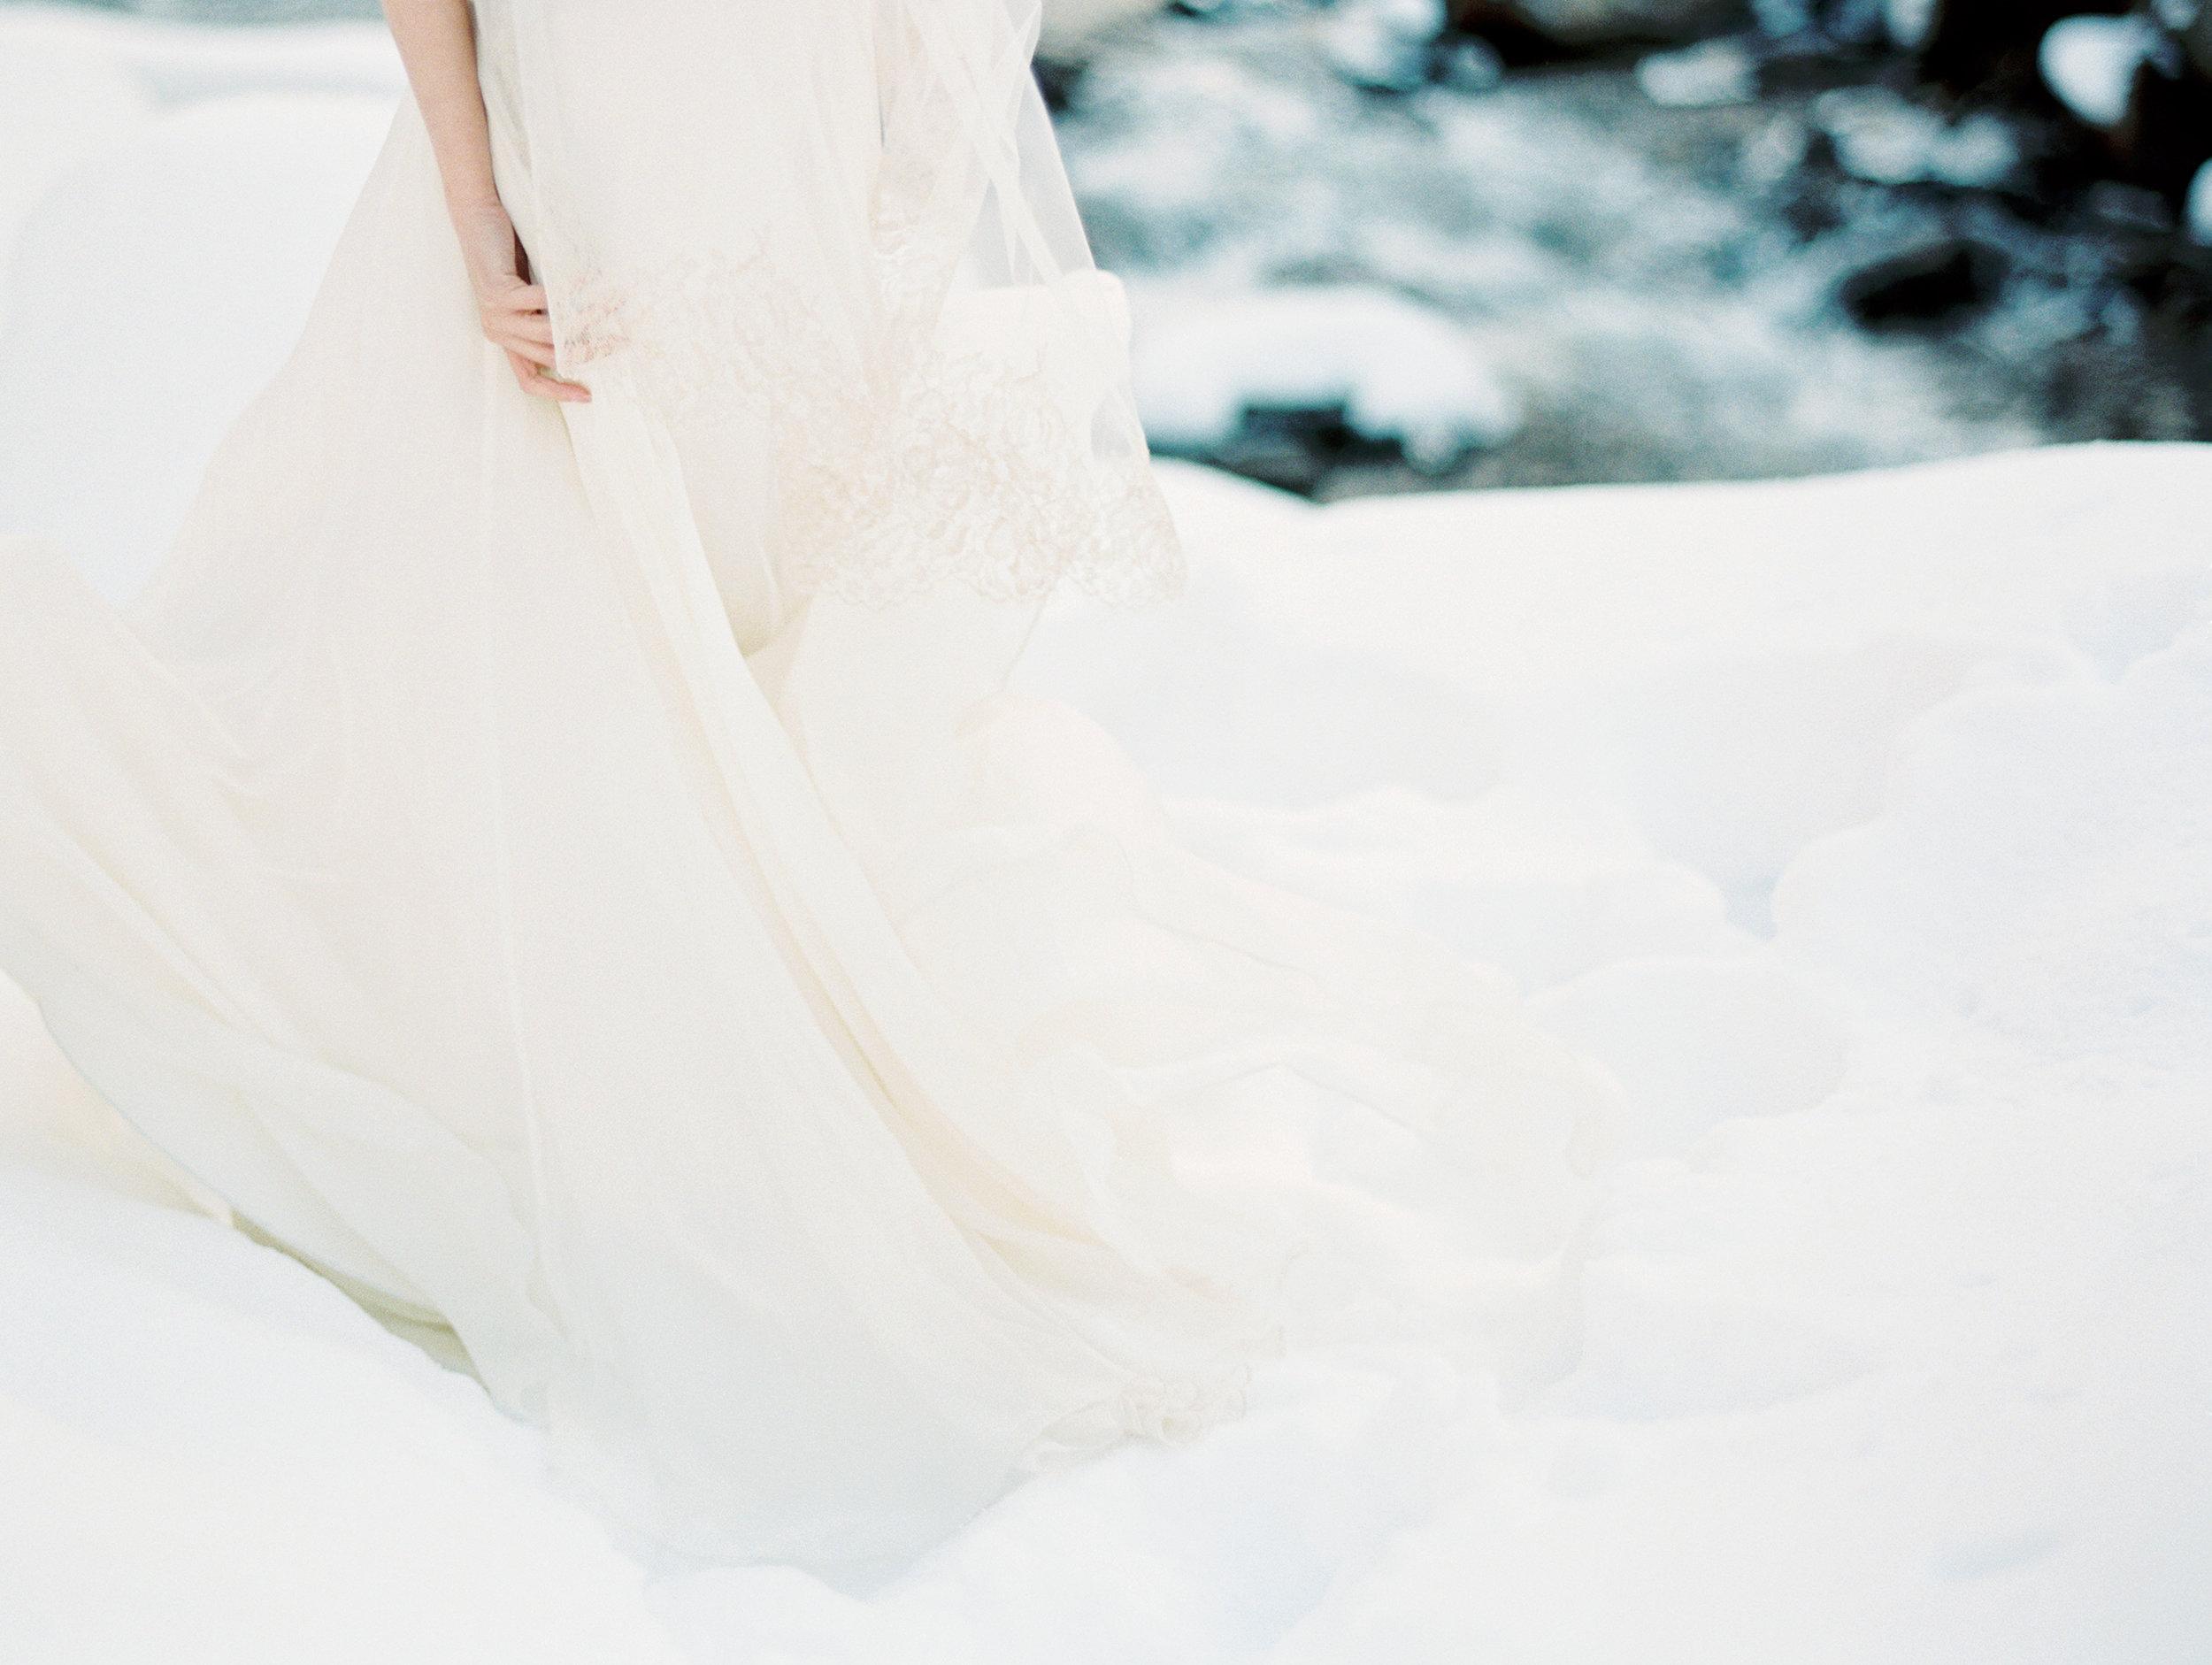 BellaCosa_WinterWonderland-108.jpg